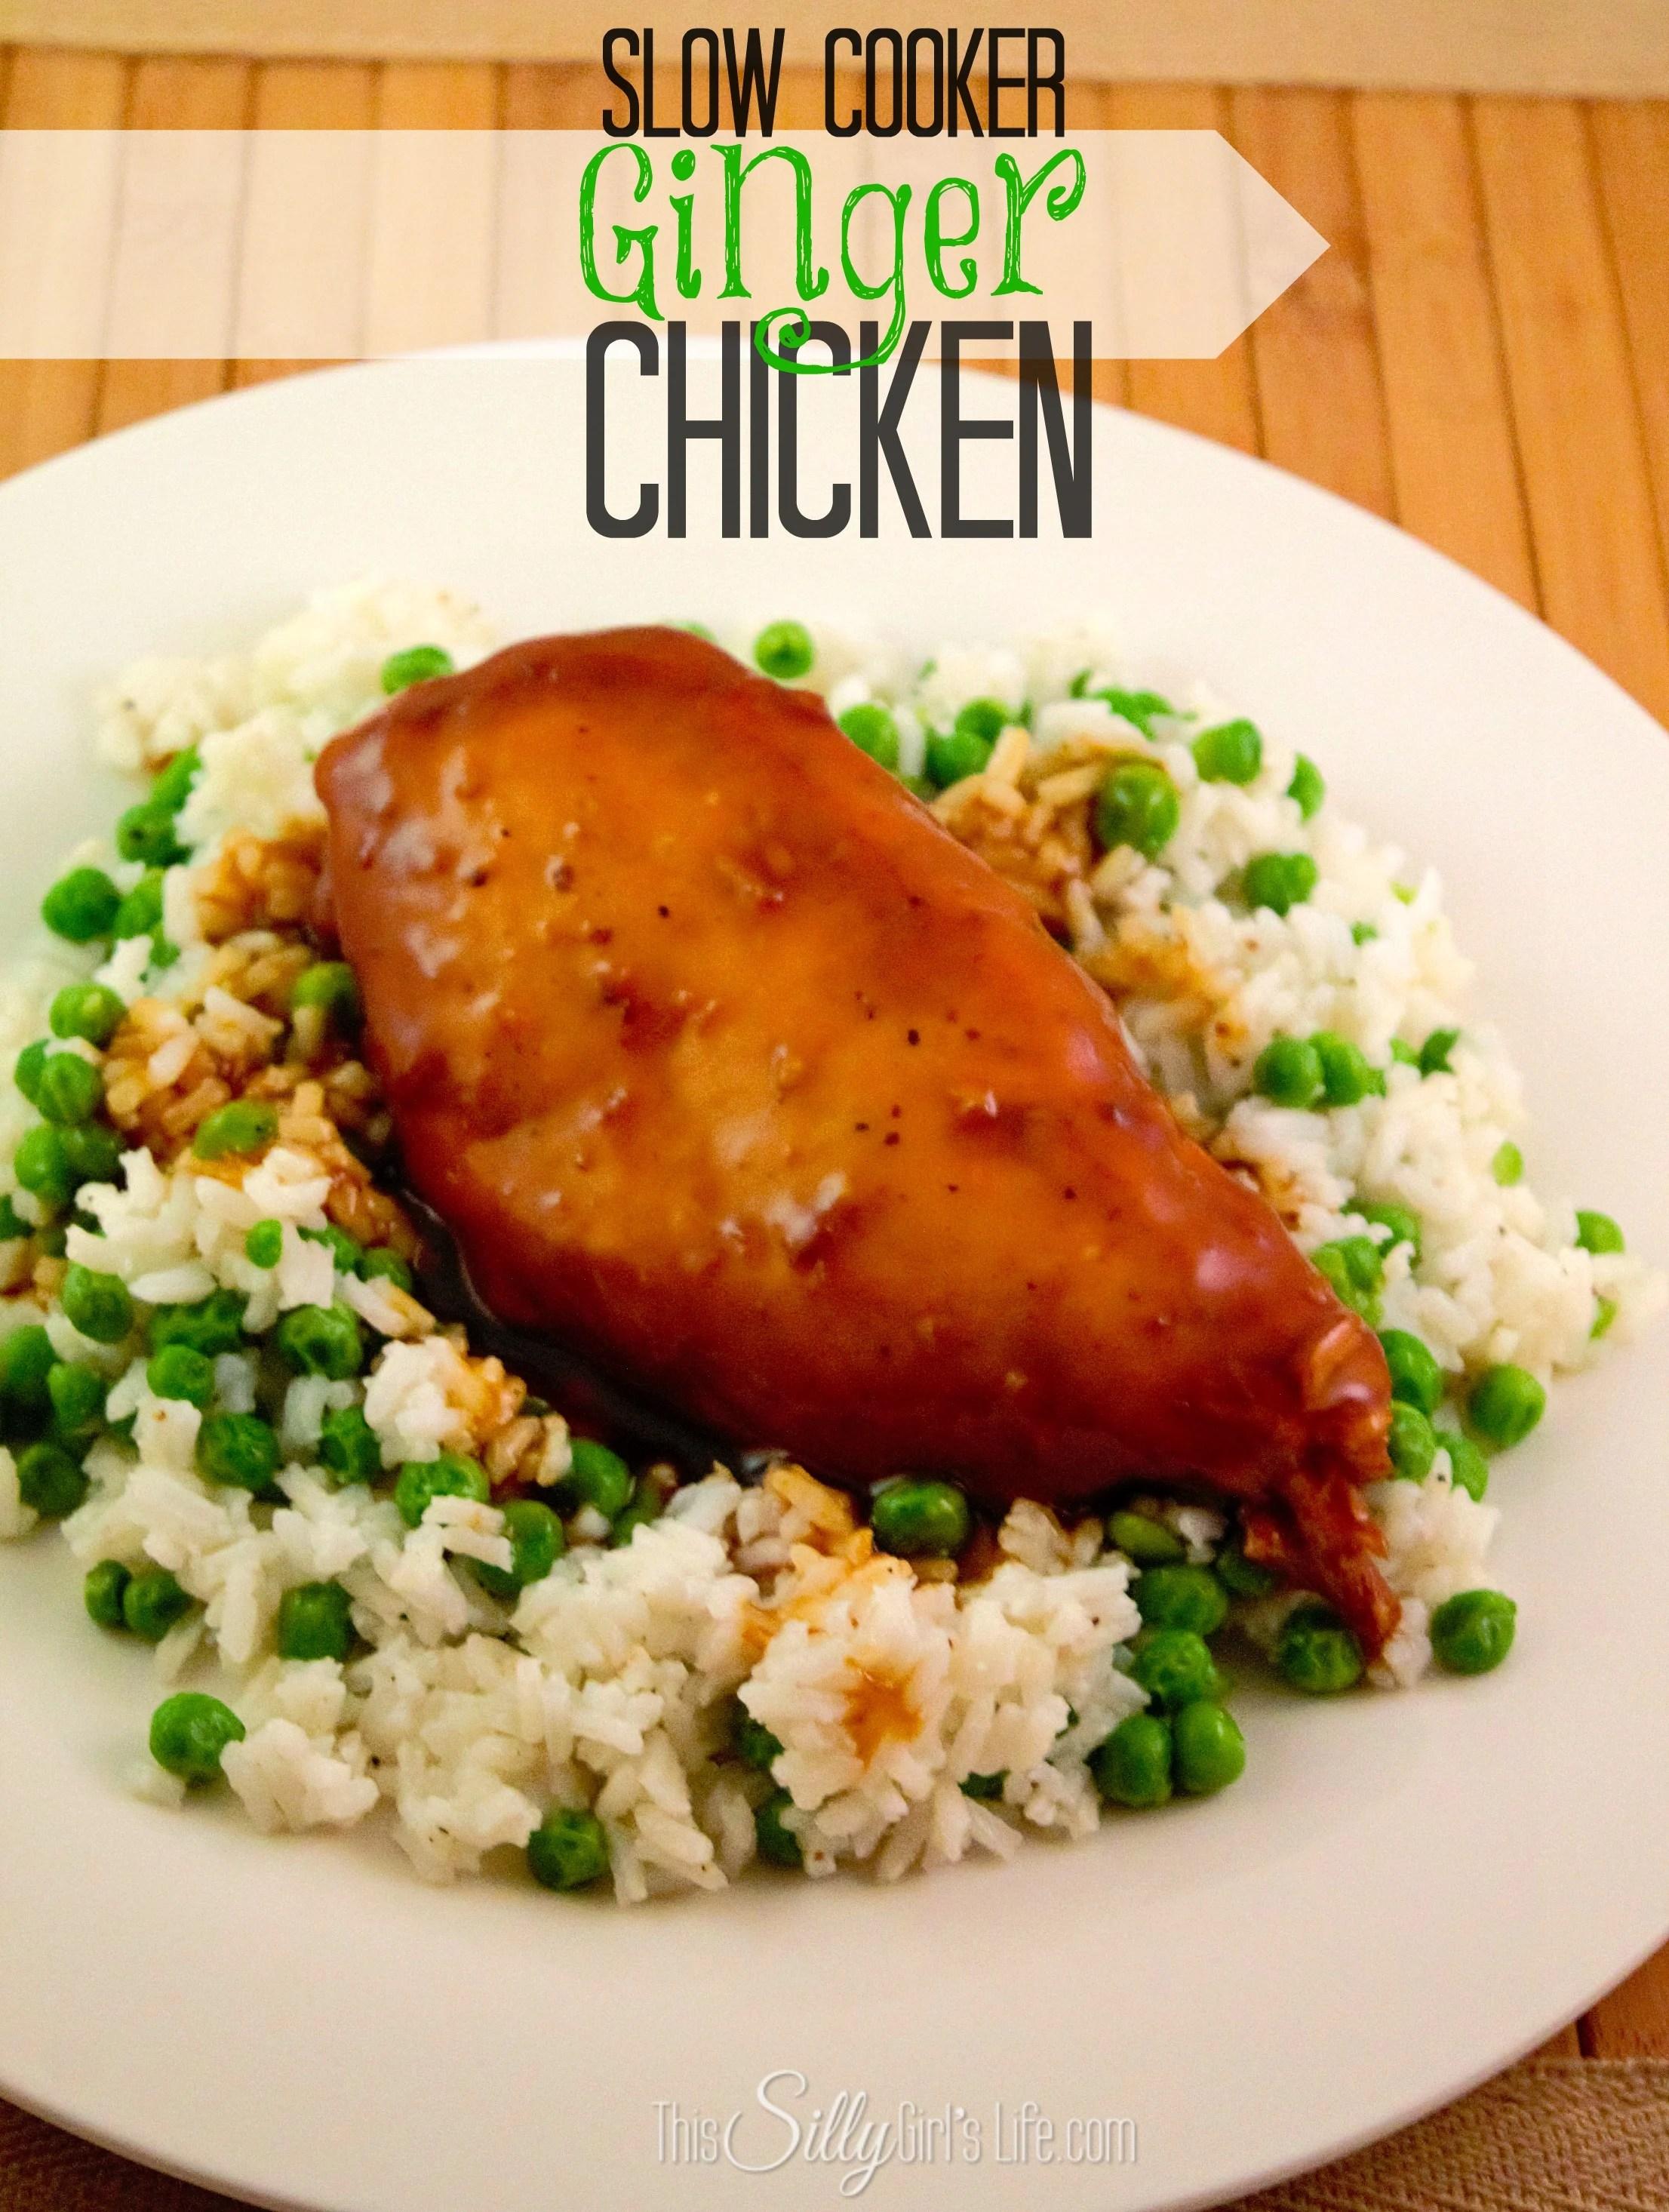 Slow Cooker Ginger Chicken recipe from https://ThisSillyGirlsLife.com #SlowCooker #Chicken #Asian #GingerChicken